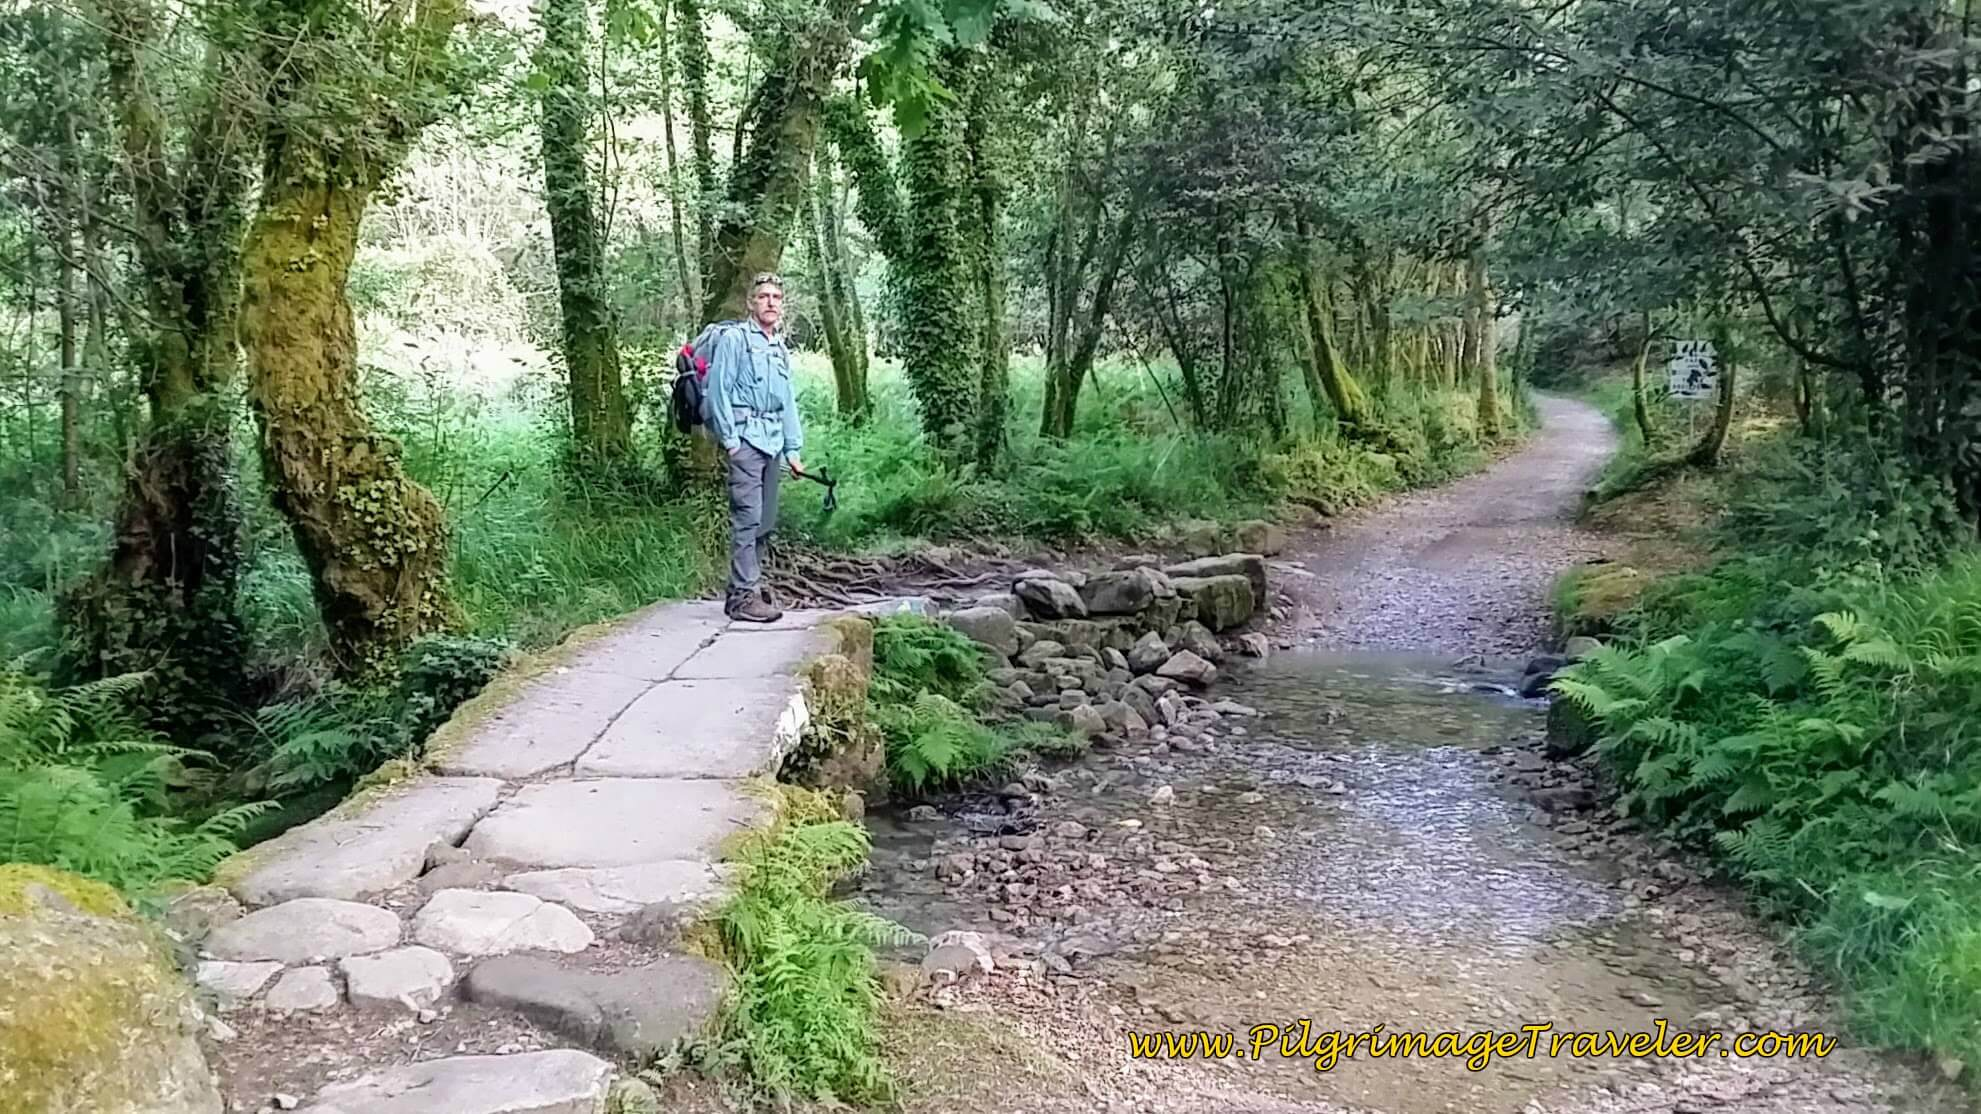 Crossing the Rîo da Gándara on day twenty-three, Camino Portugués